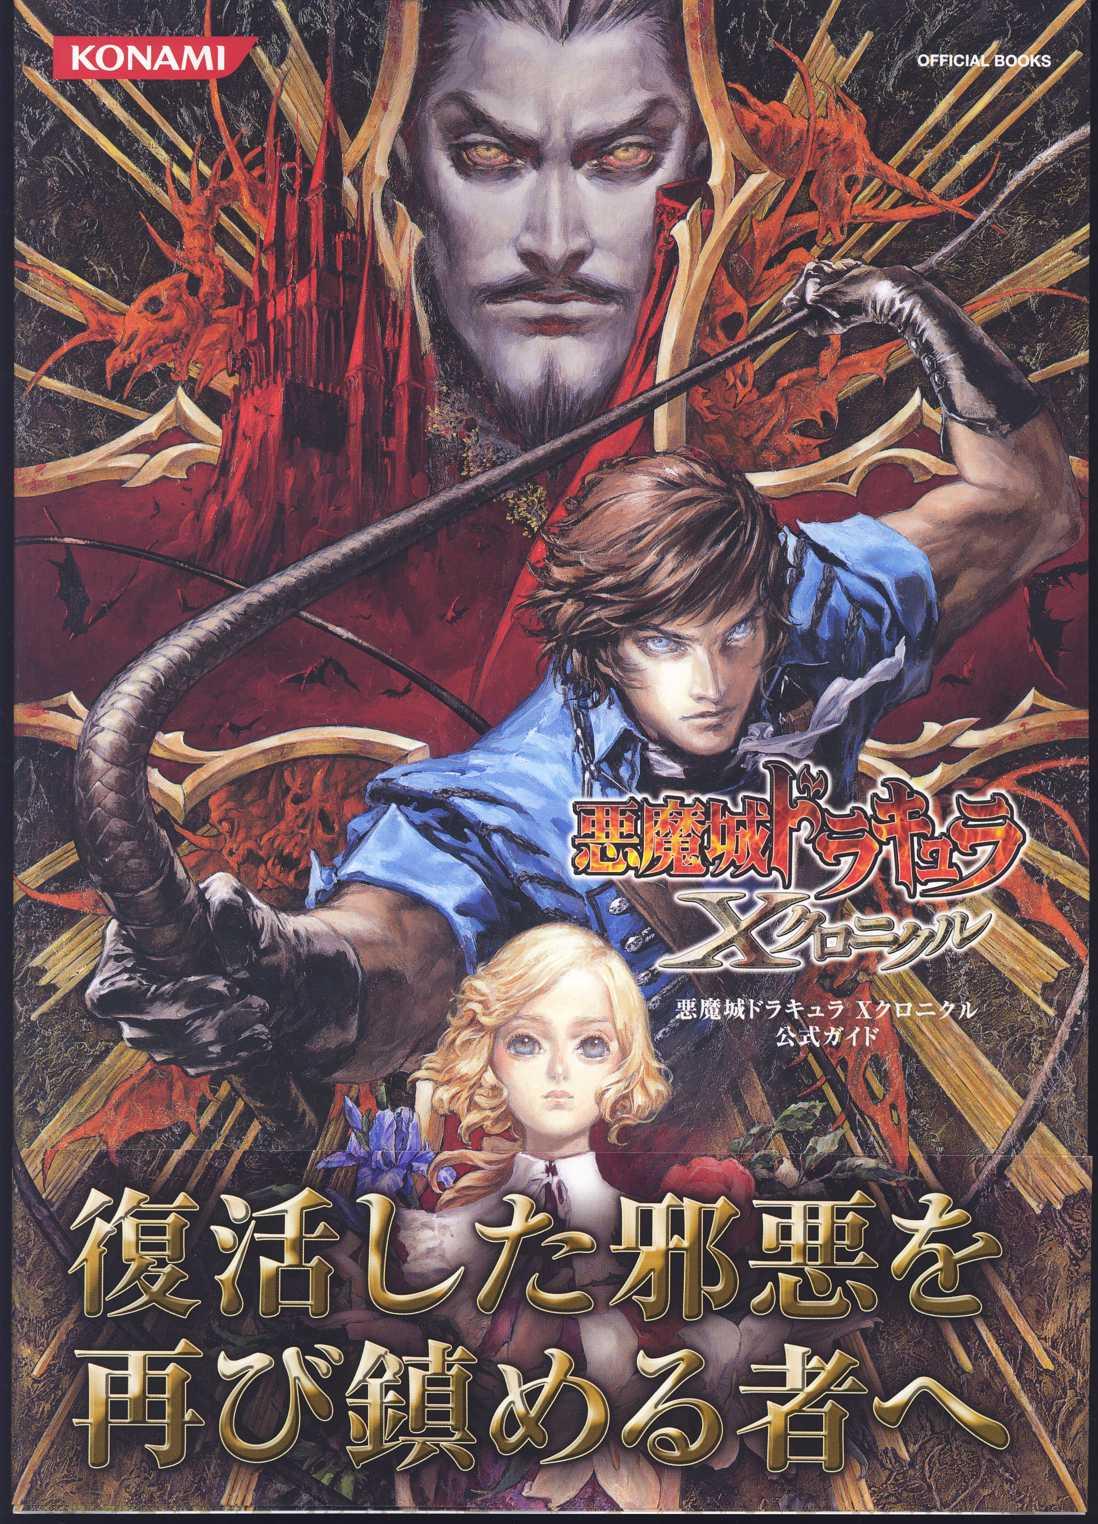 File:Konami DXC Guide.jpg